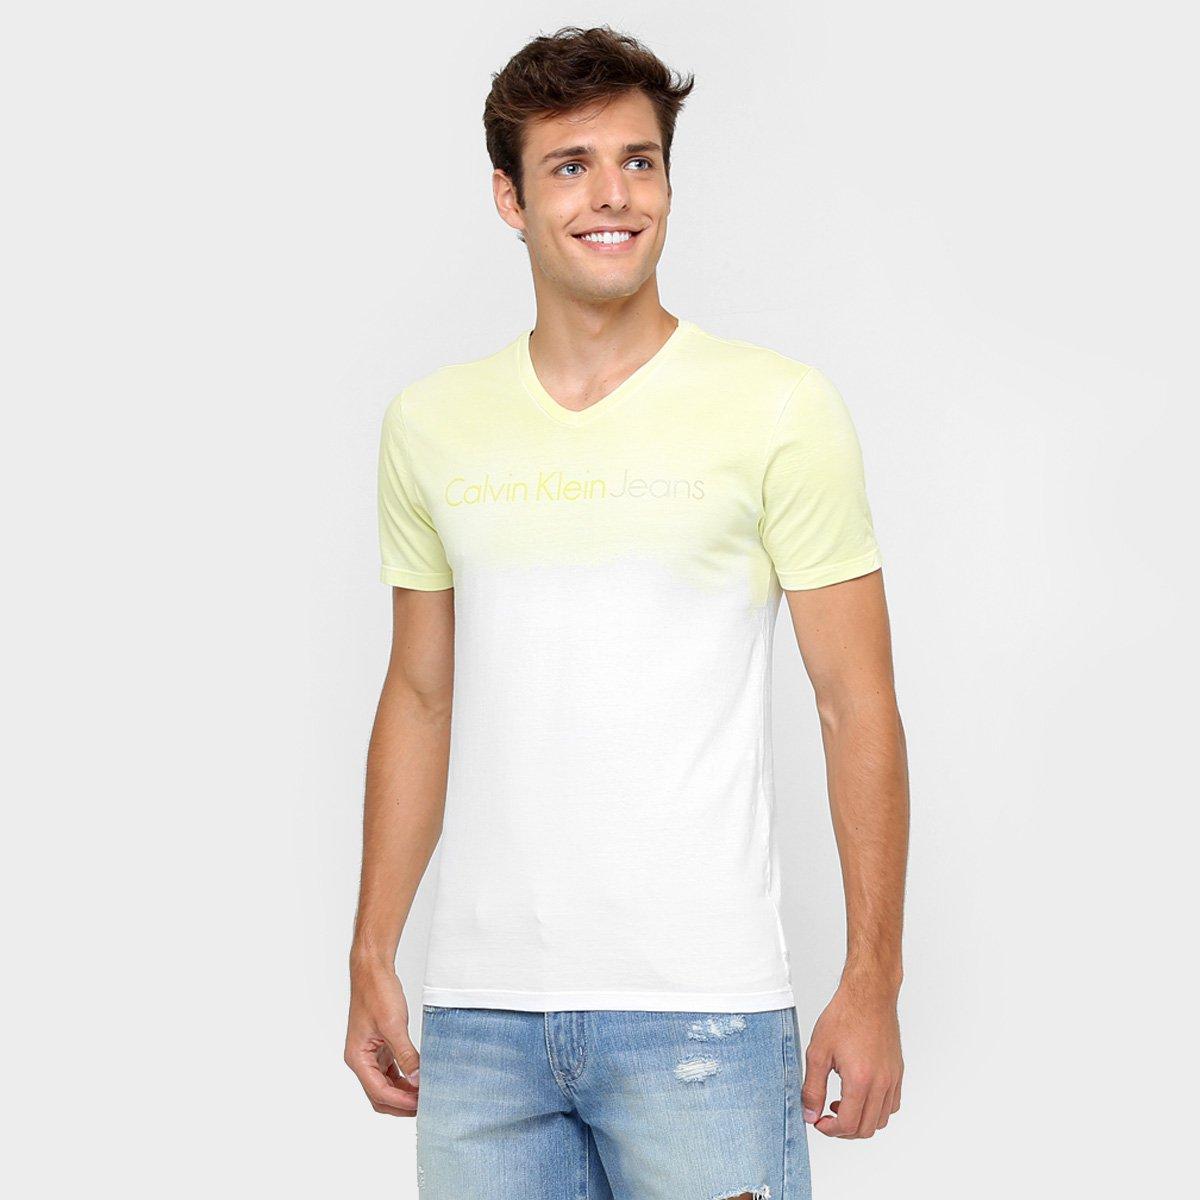 ed91c9b4567a15 Camiseta Calvin Klein Degradê